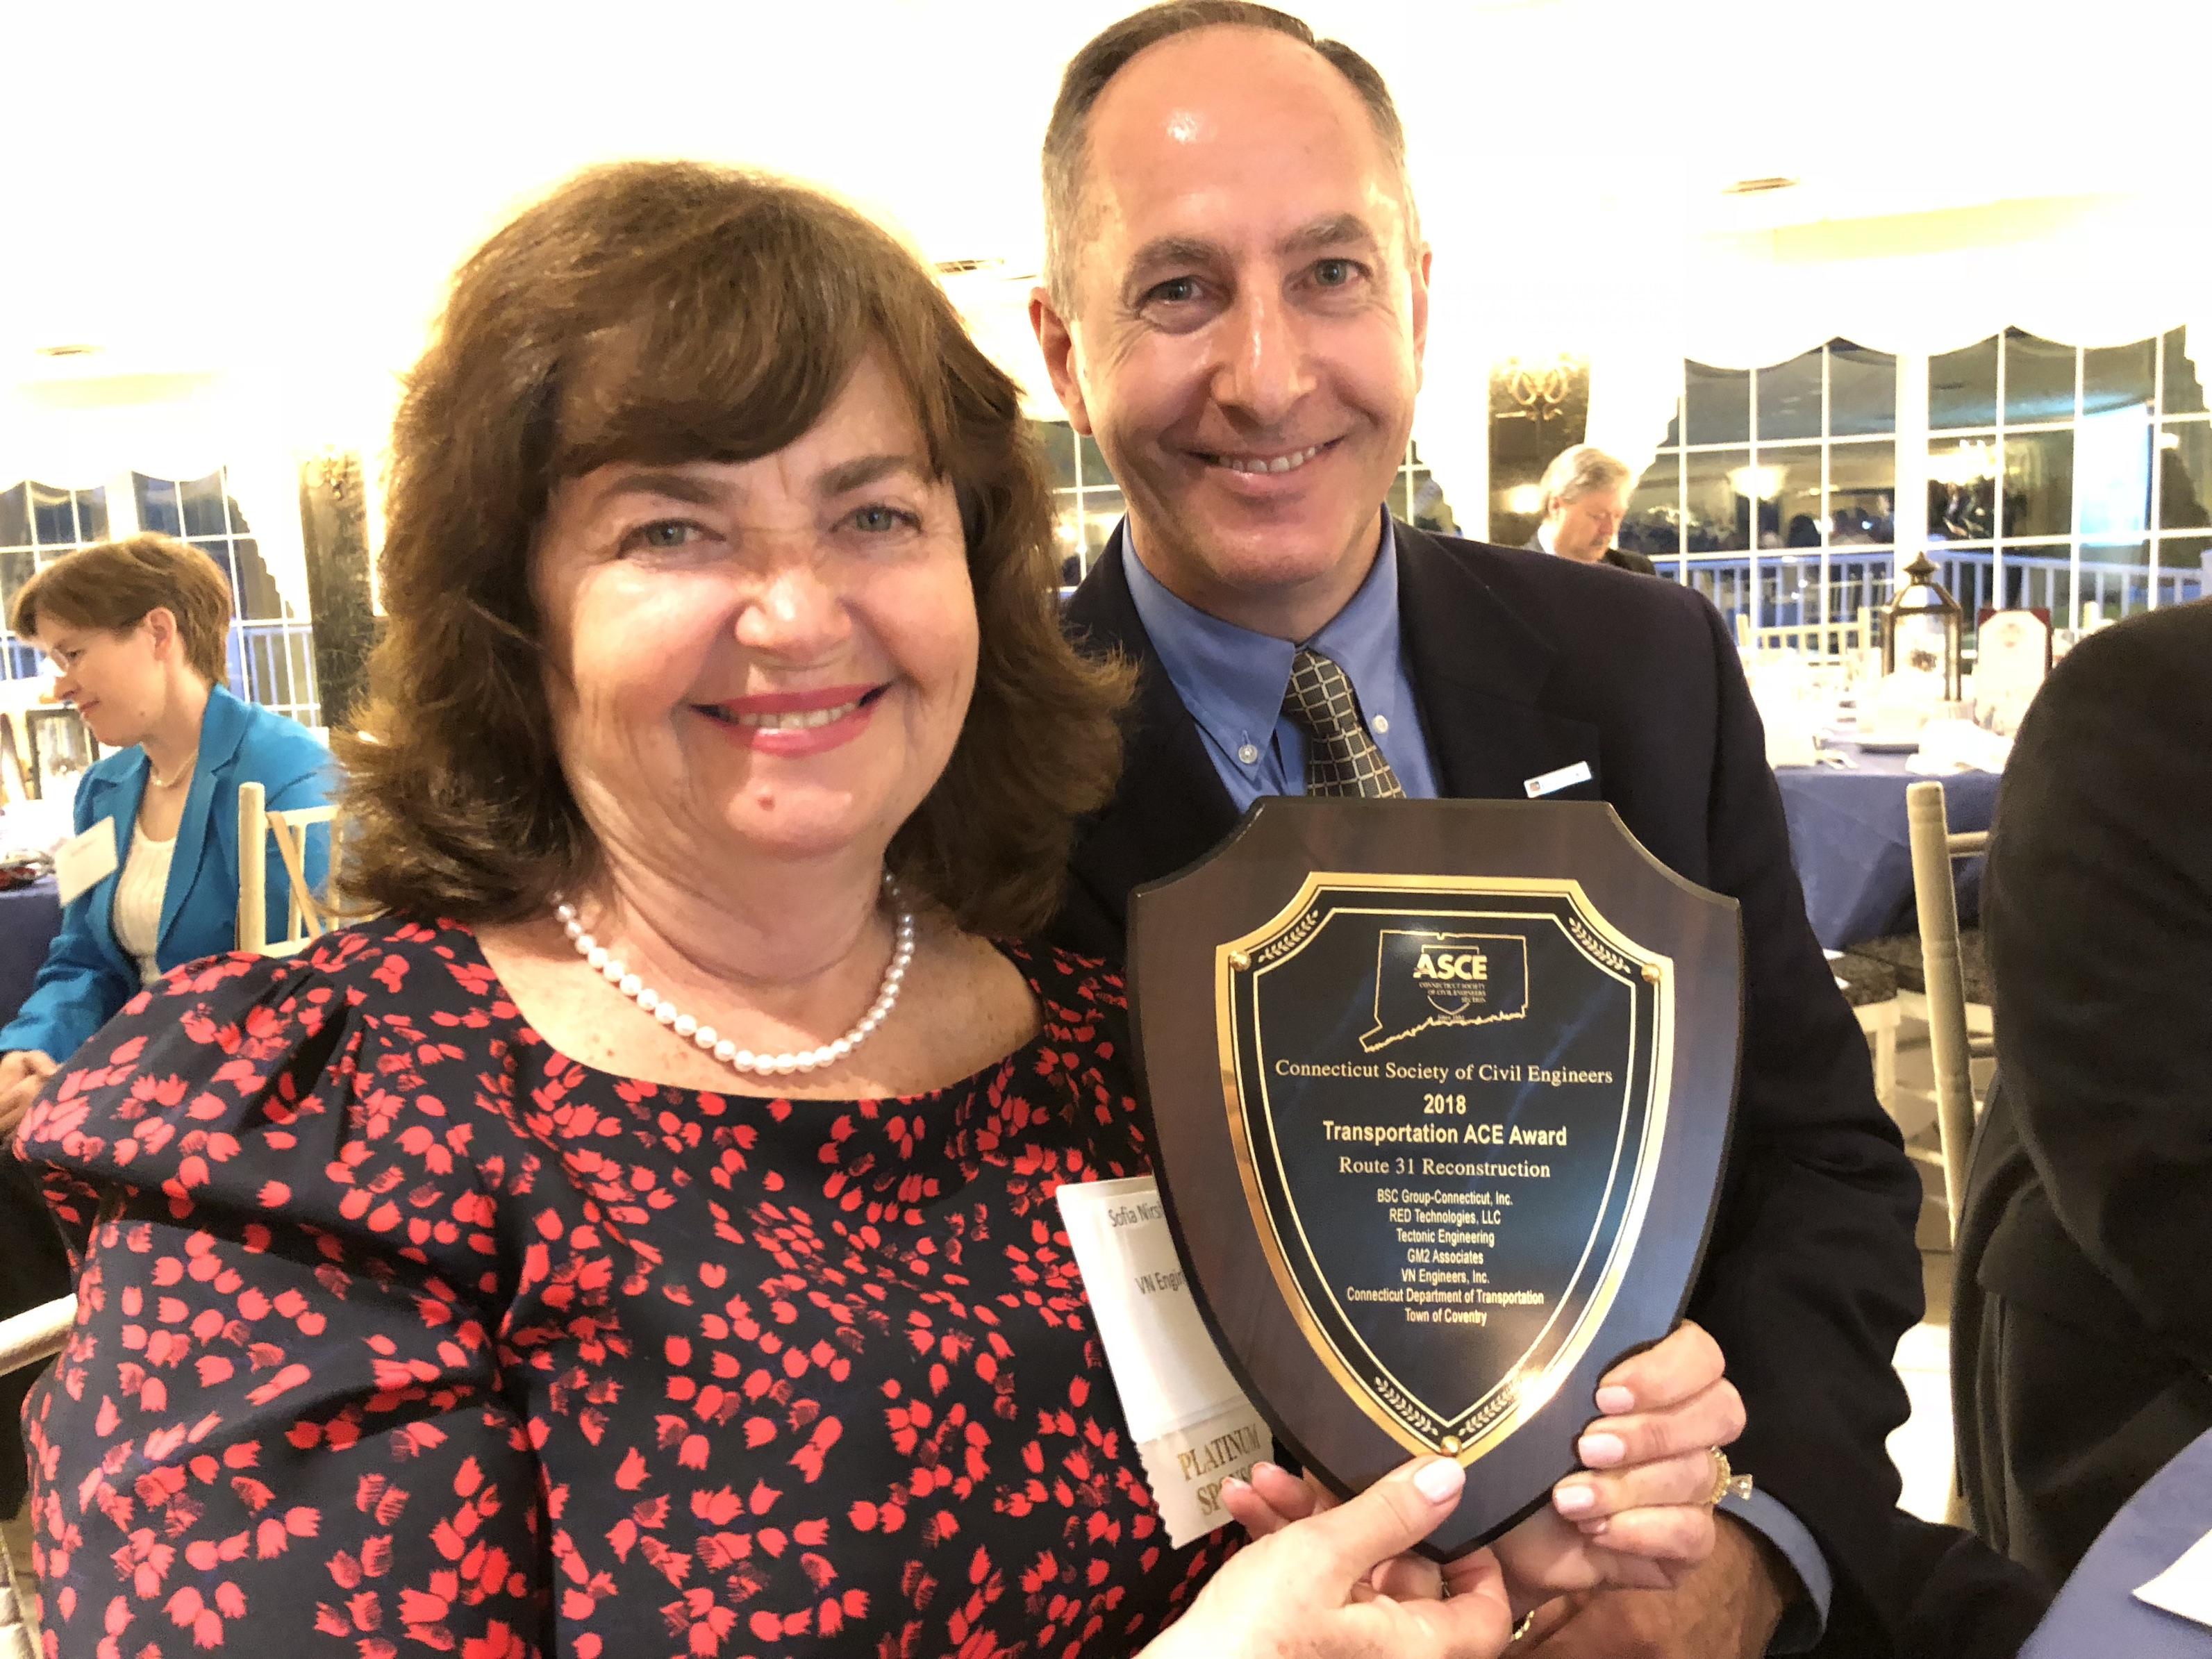 VN Engineers Awarded 2018 ASCE Transportation Award